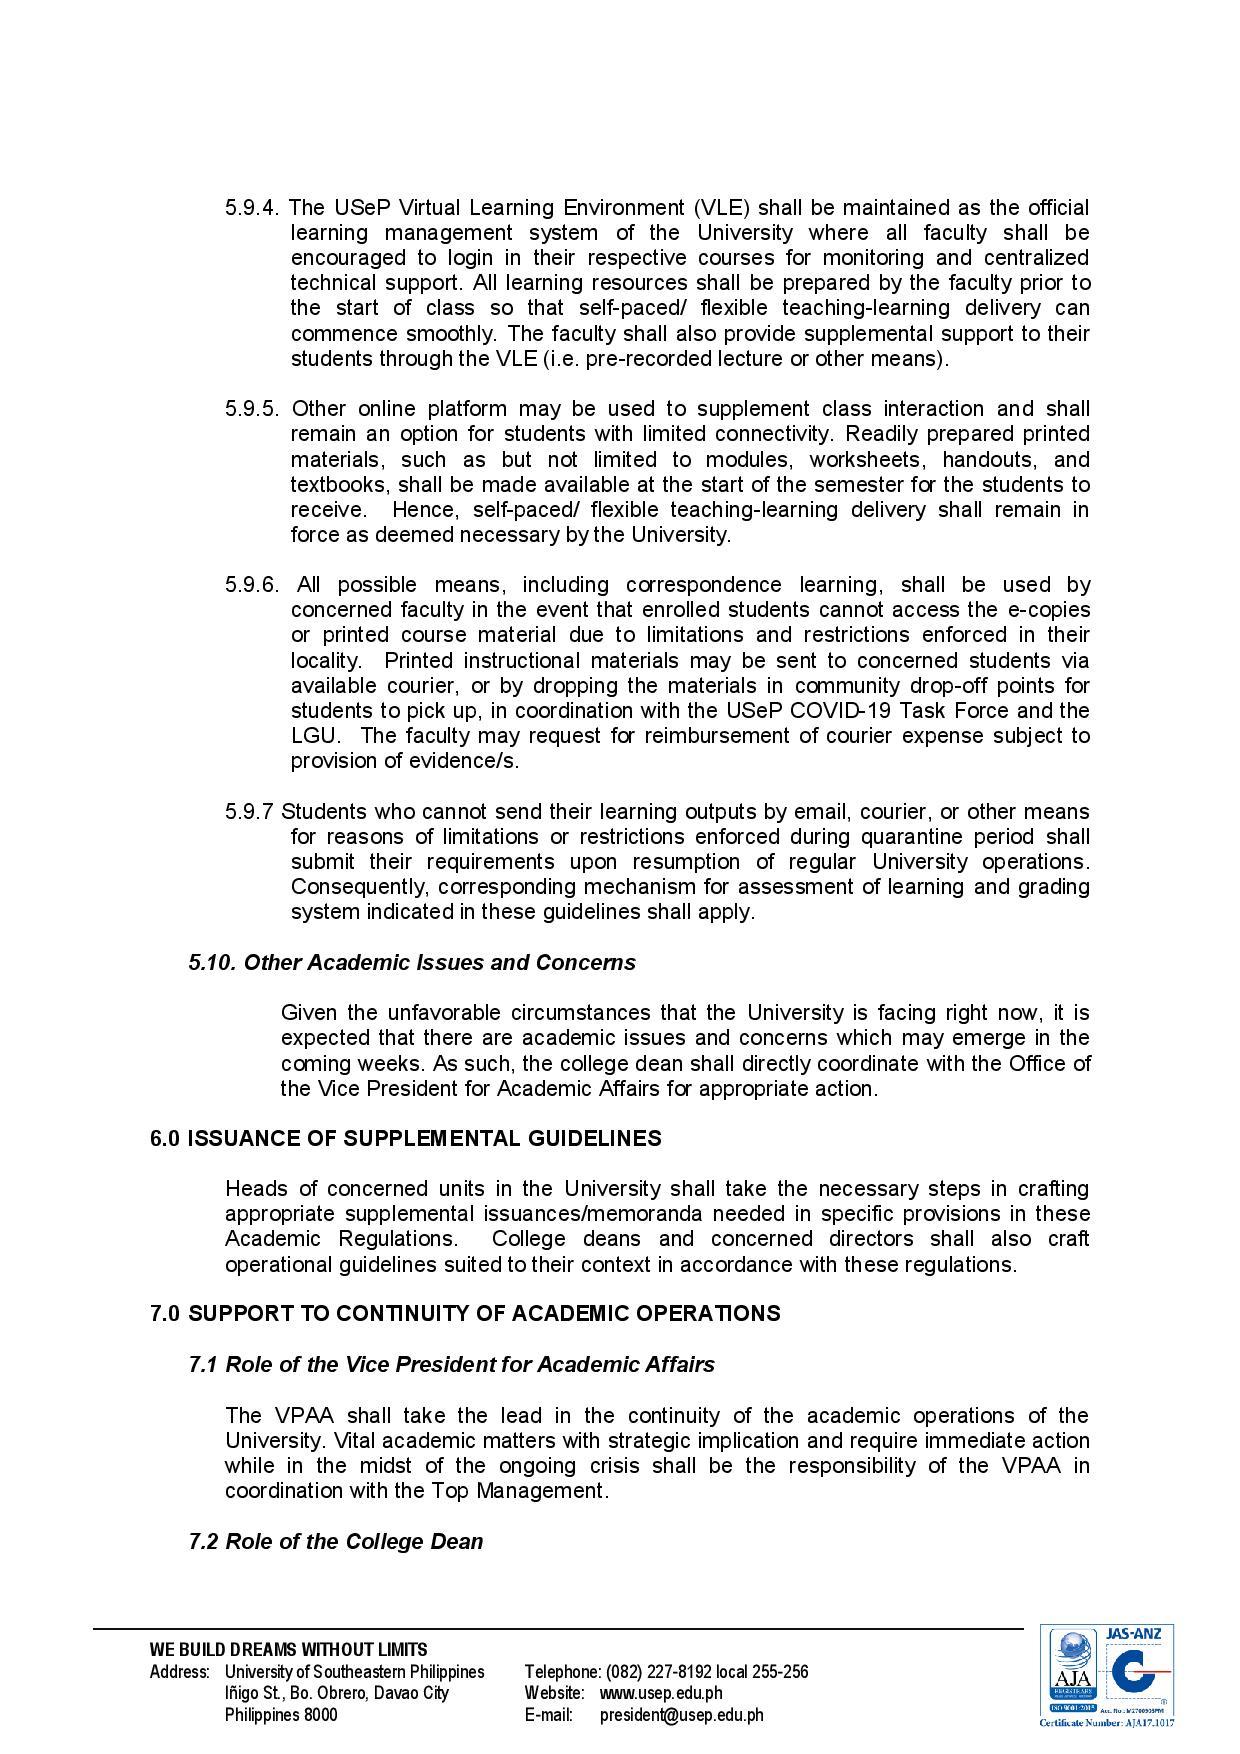 mc-02-s-2020-memorandum-circular-on-usep-academic-regulations-amidst-the-covid-19-pandemic-page-008